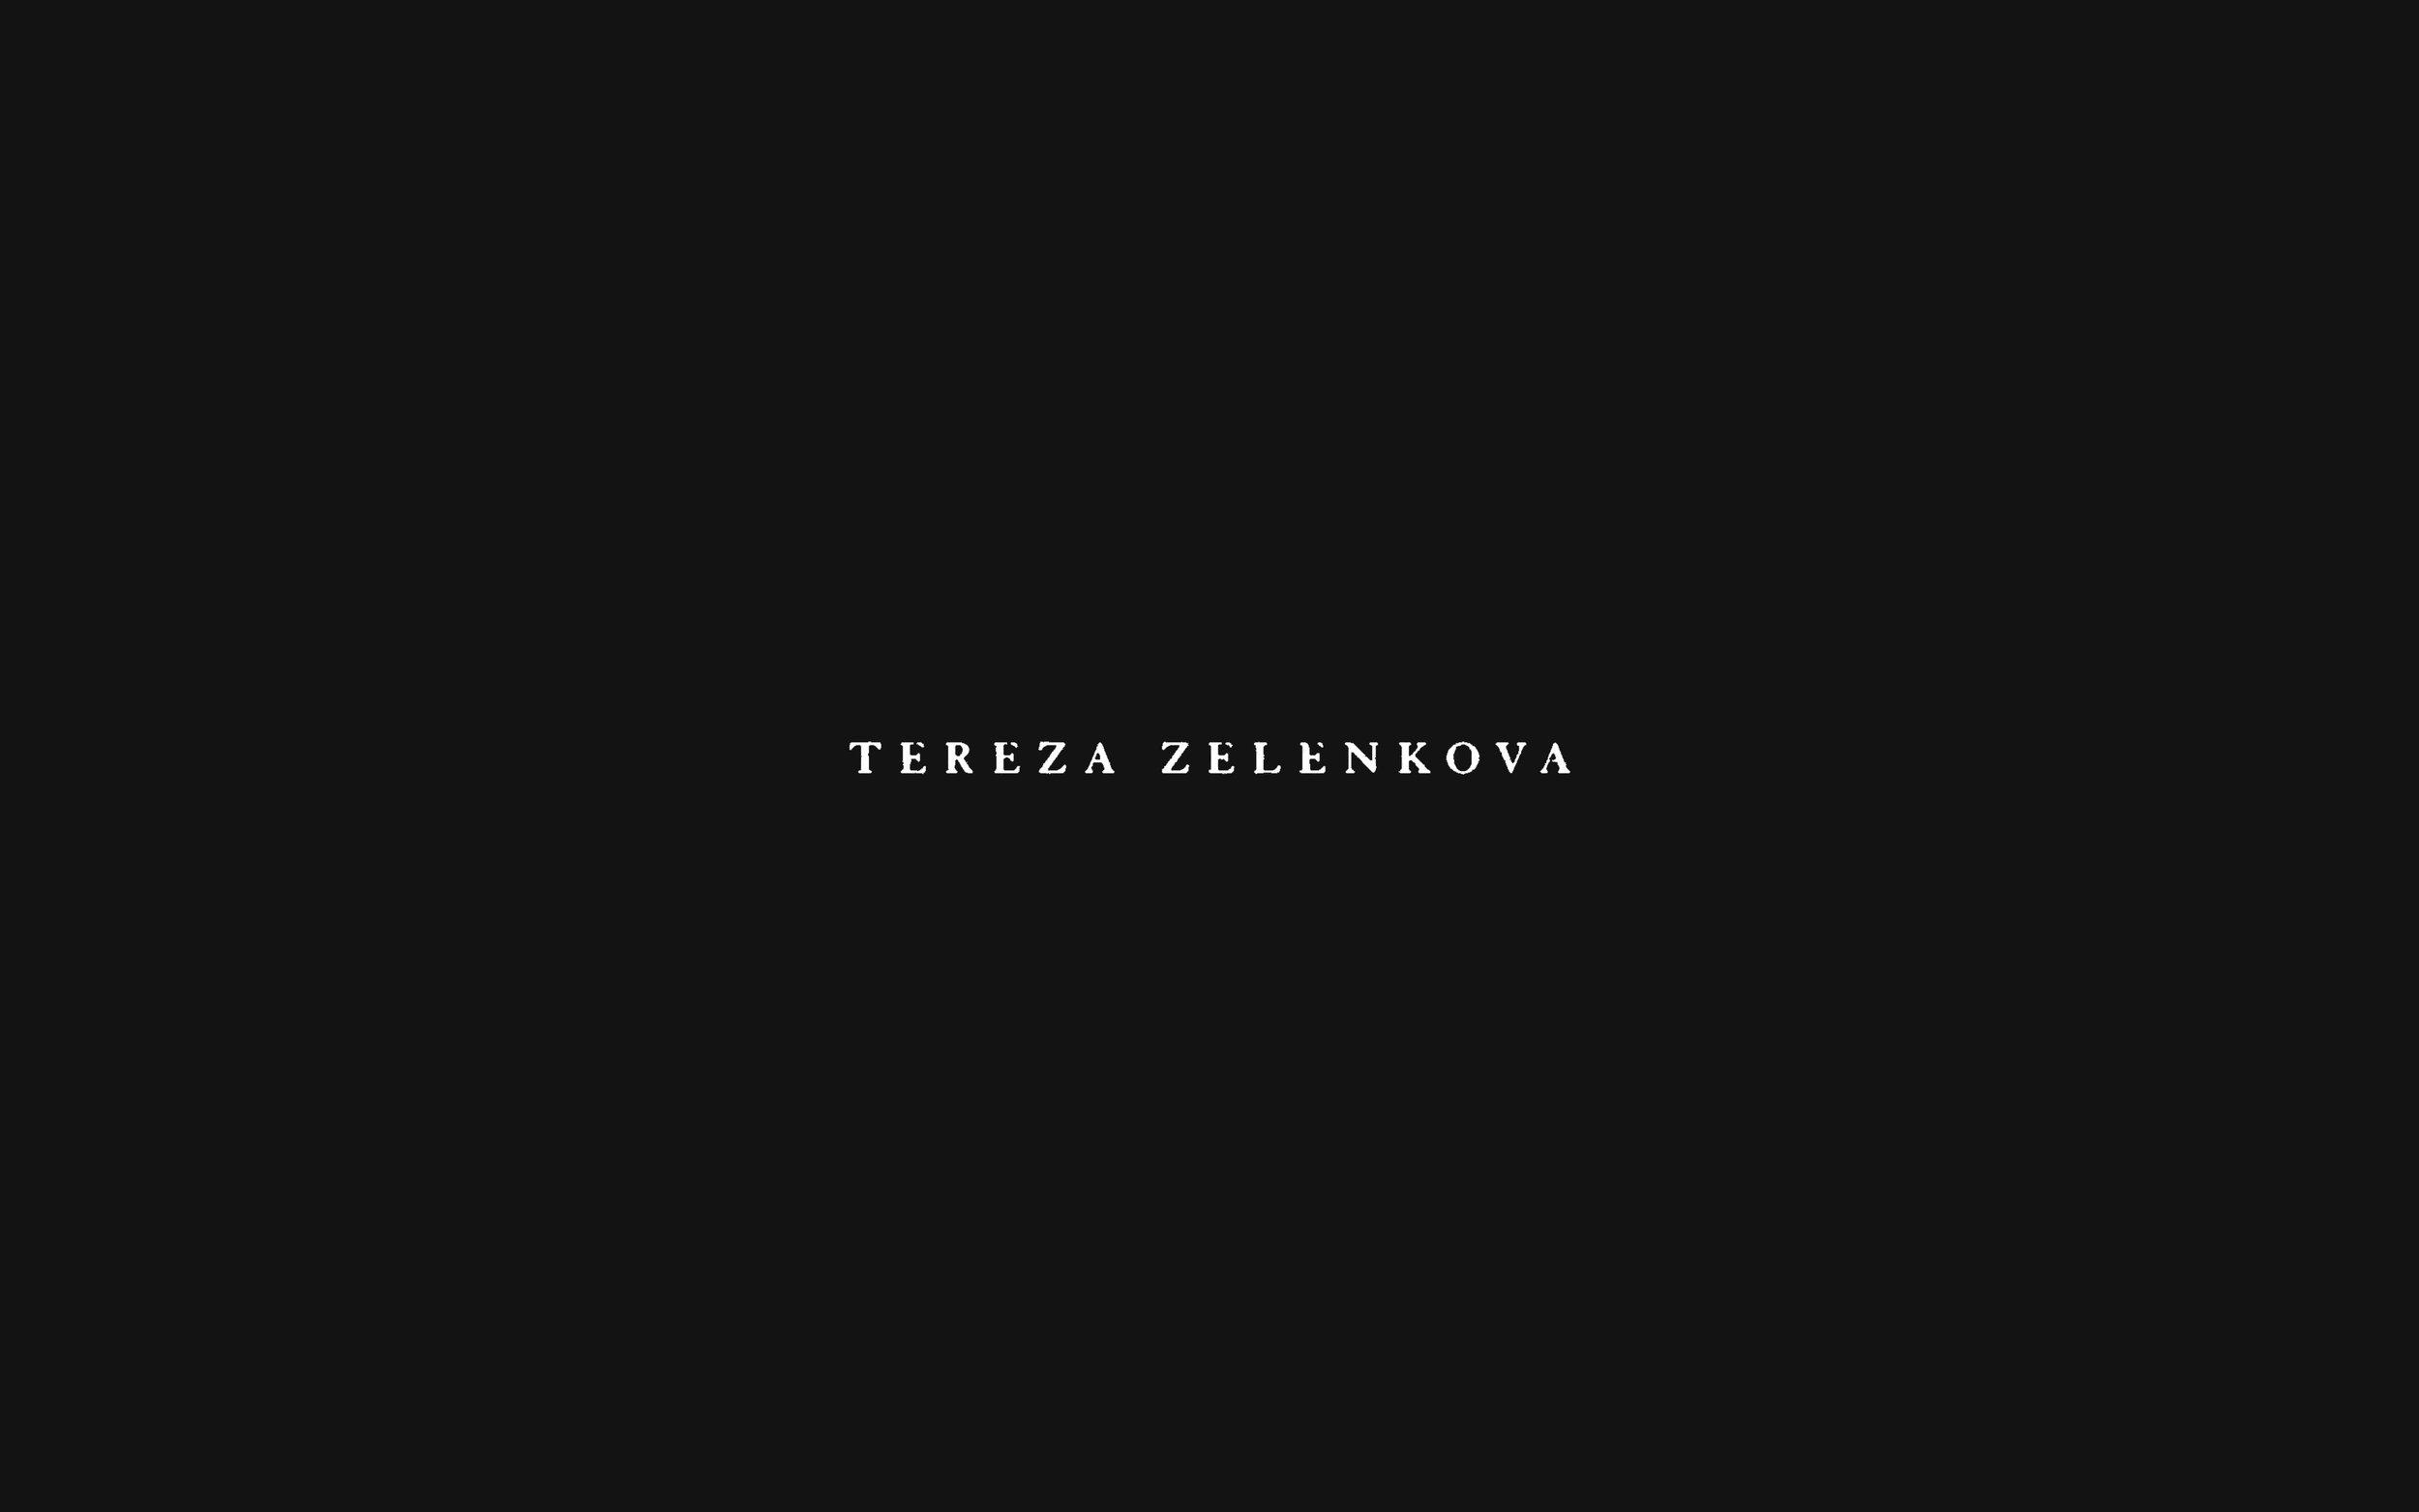 7C__Tereza_Zelenkova_00.jpg